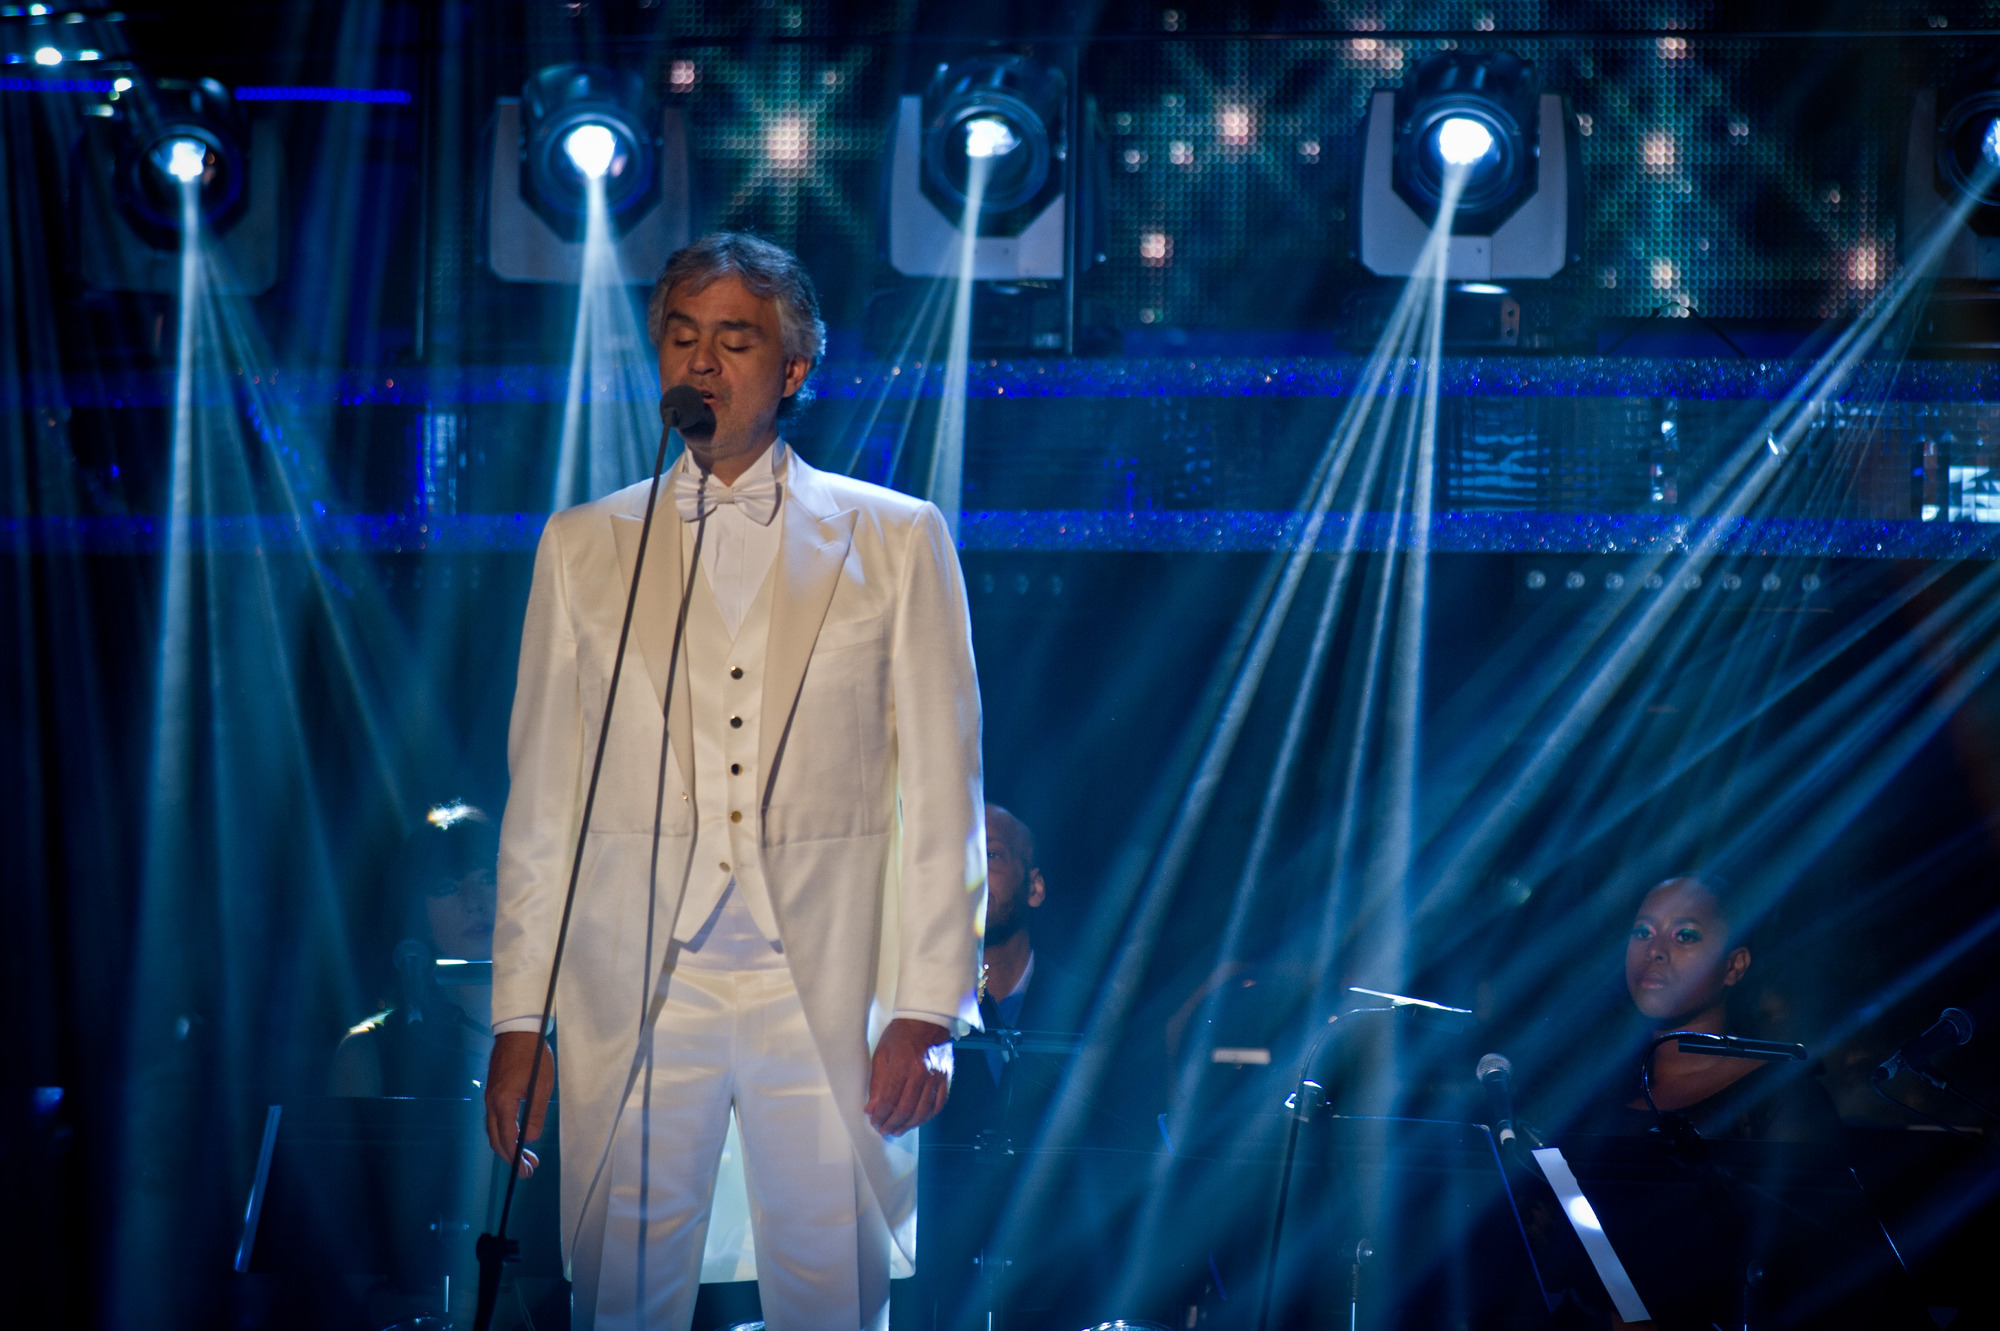 Andrea Bocelli - (C) BBC - Photographer: Des Willie